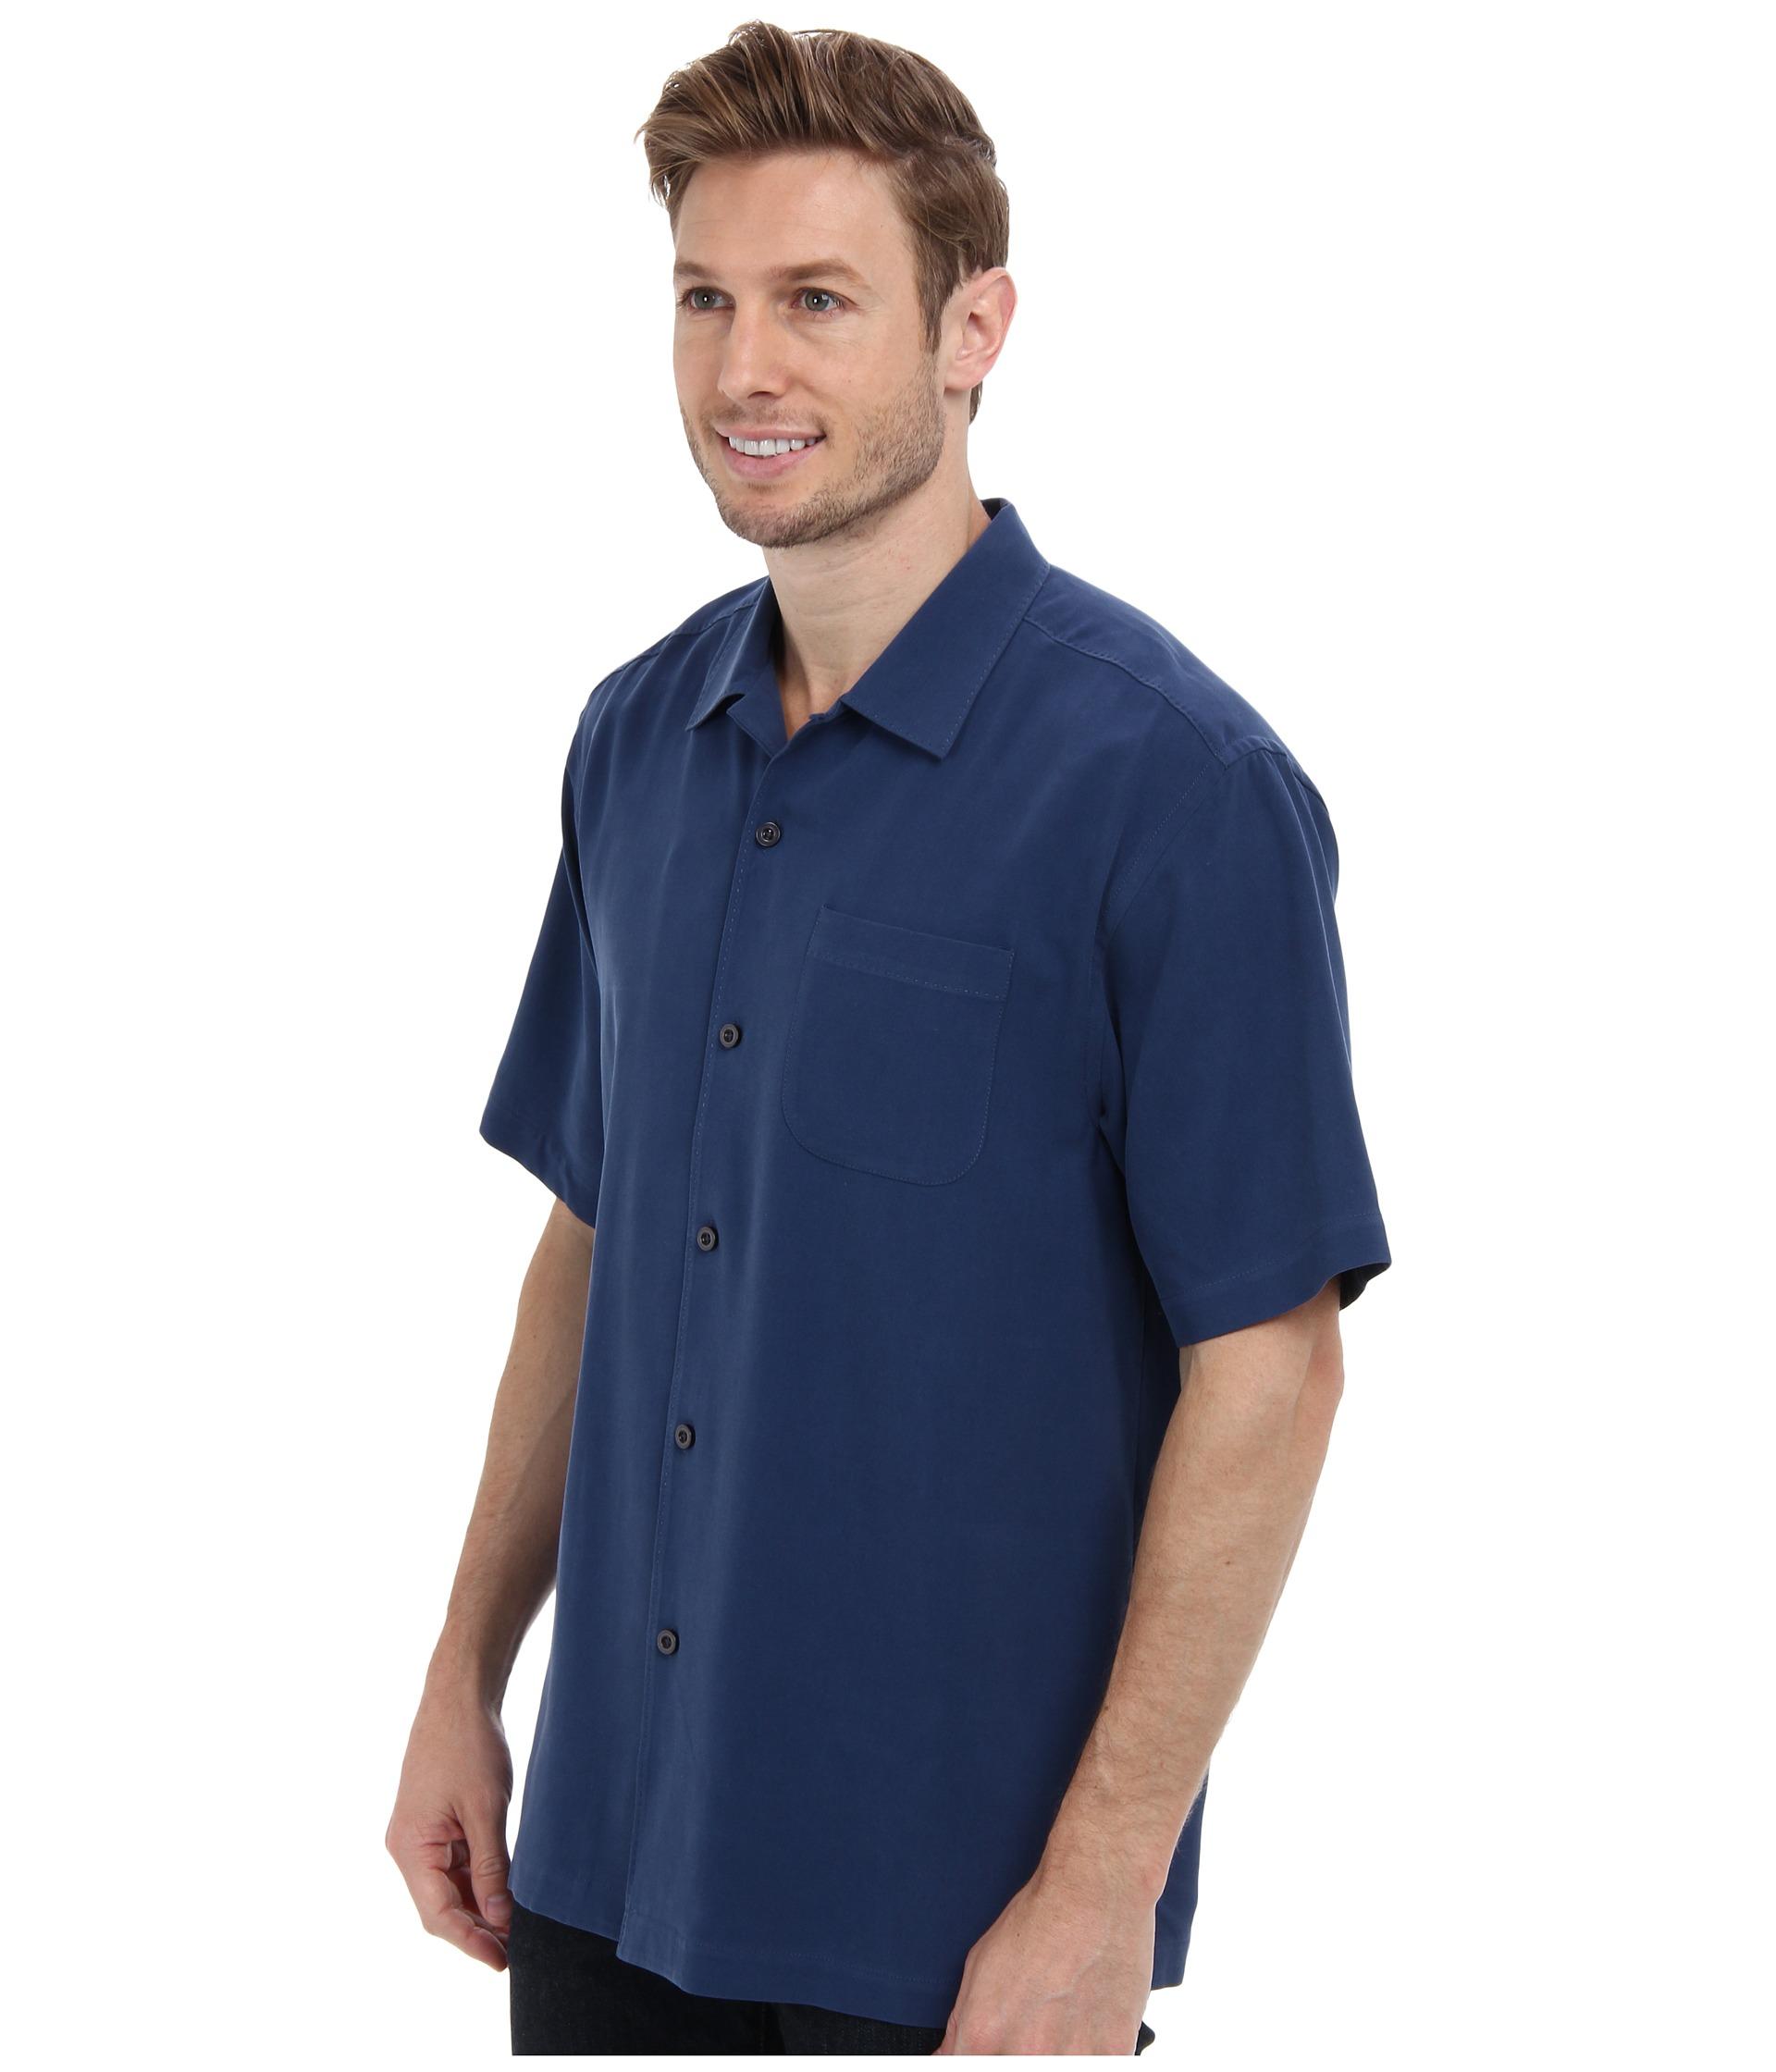 Tommy bahama catalina twill camp shirt in blue for men for Tommy bahama catalina twill silk camp shirt